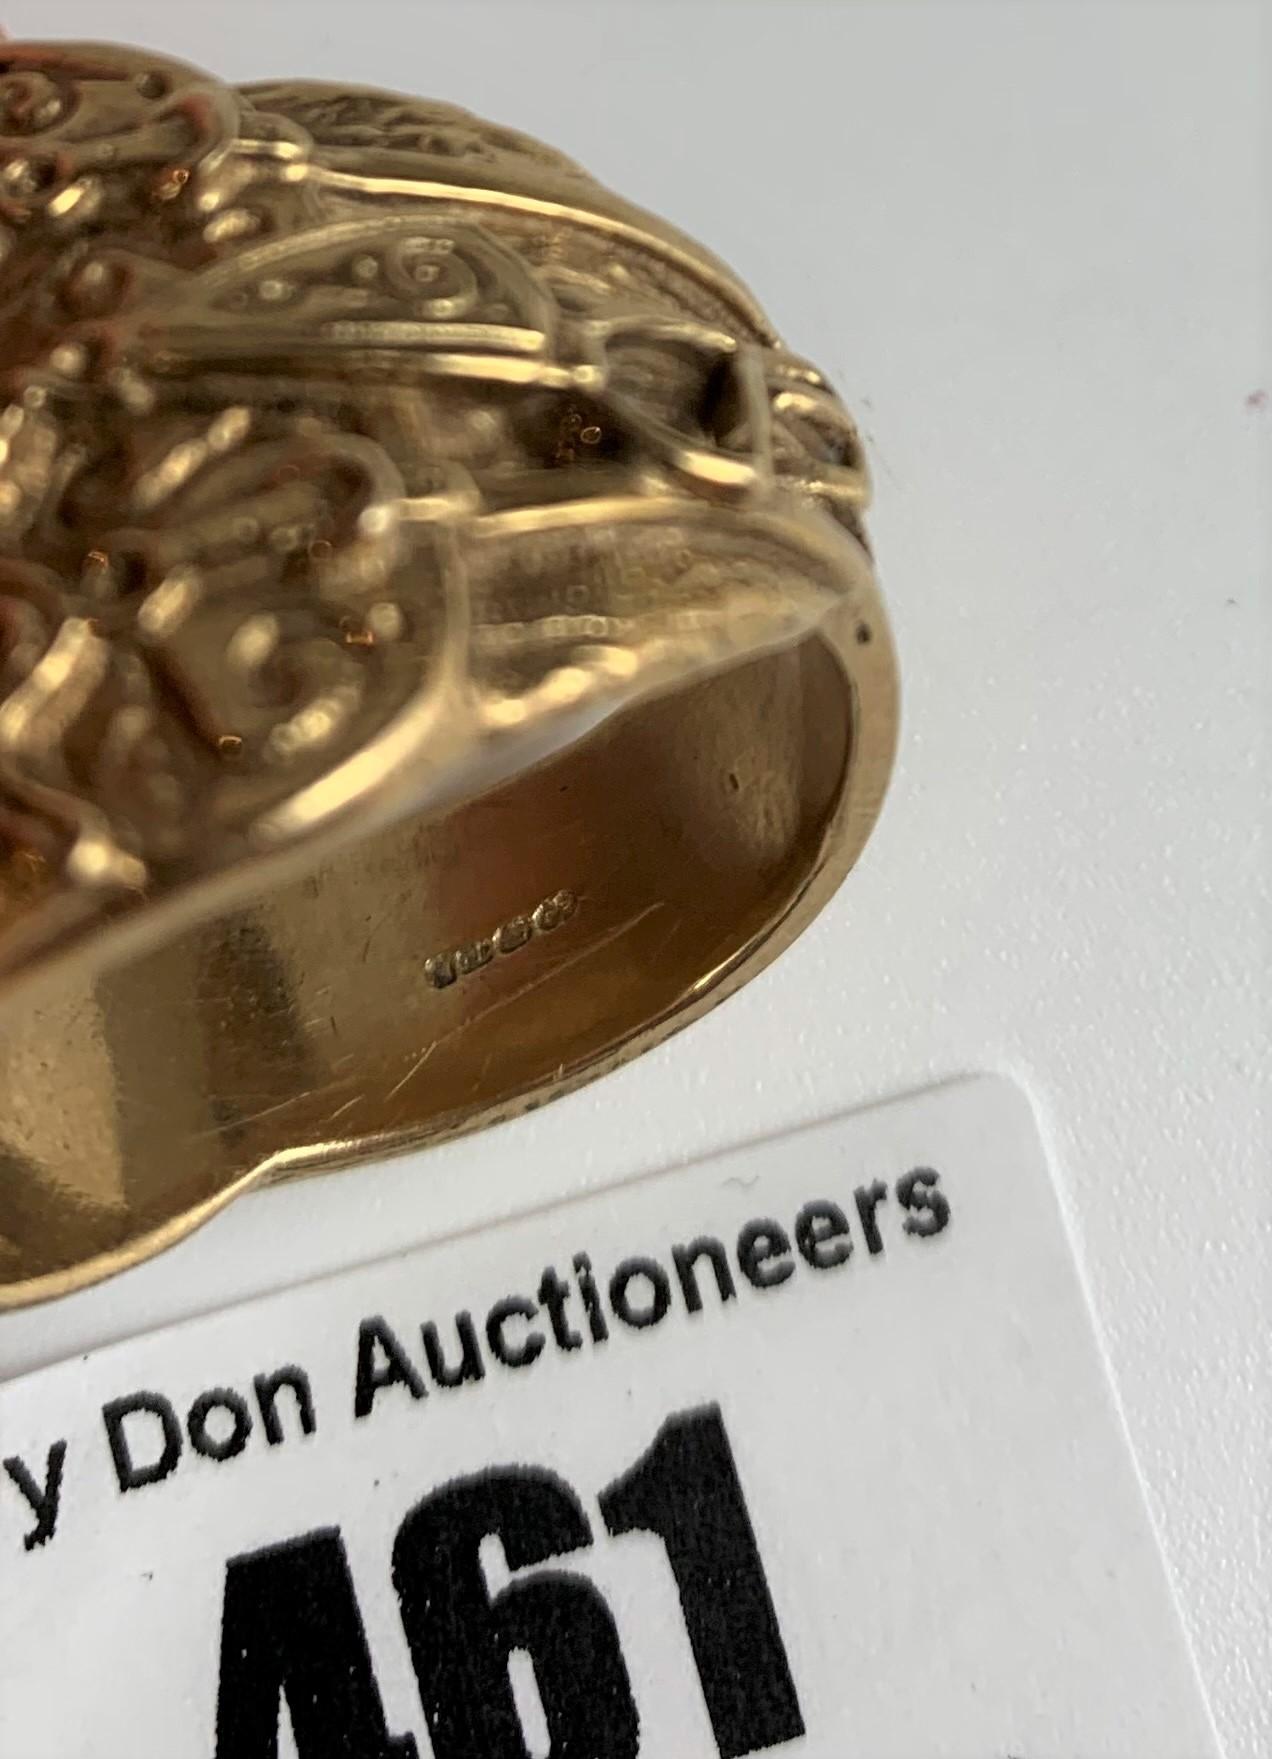 9k gold gents saddle ring, size Z+, w:26 gms - Image 6 of 6